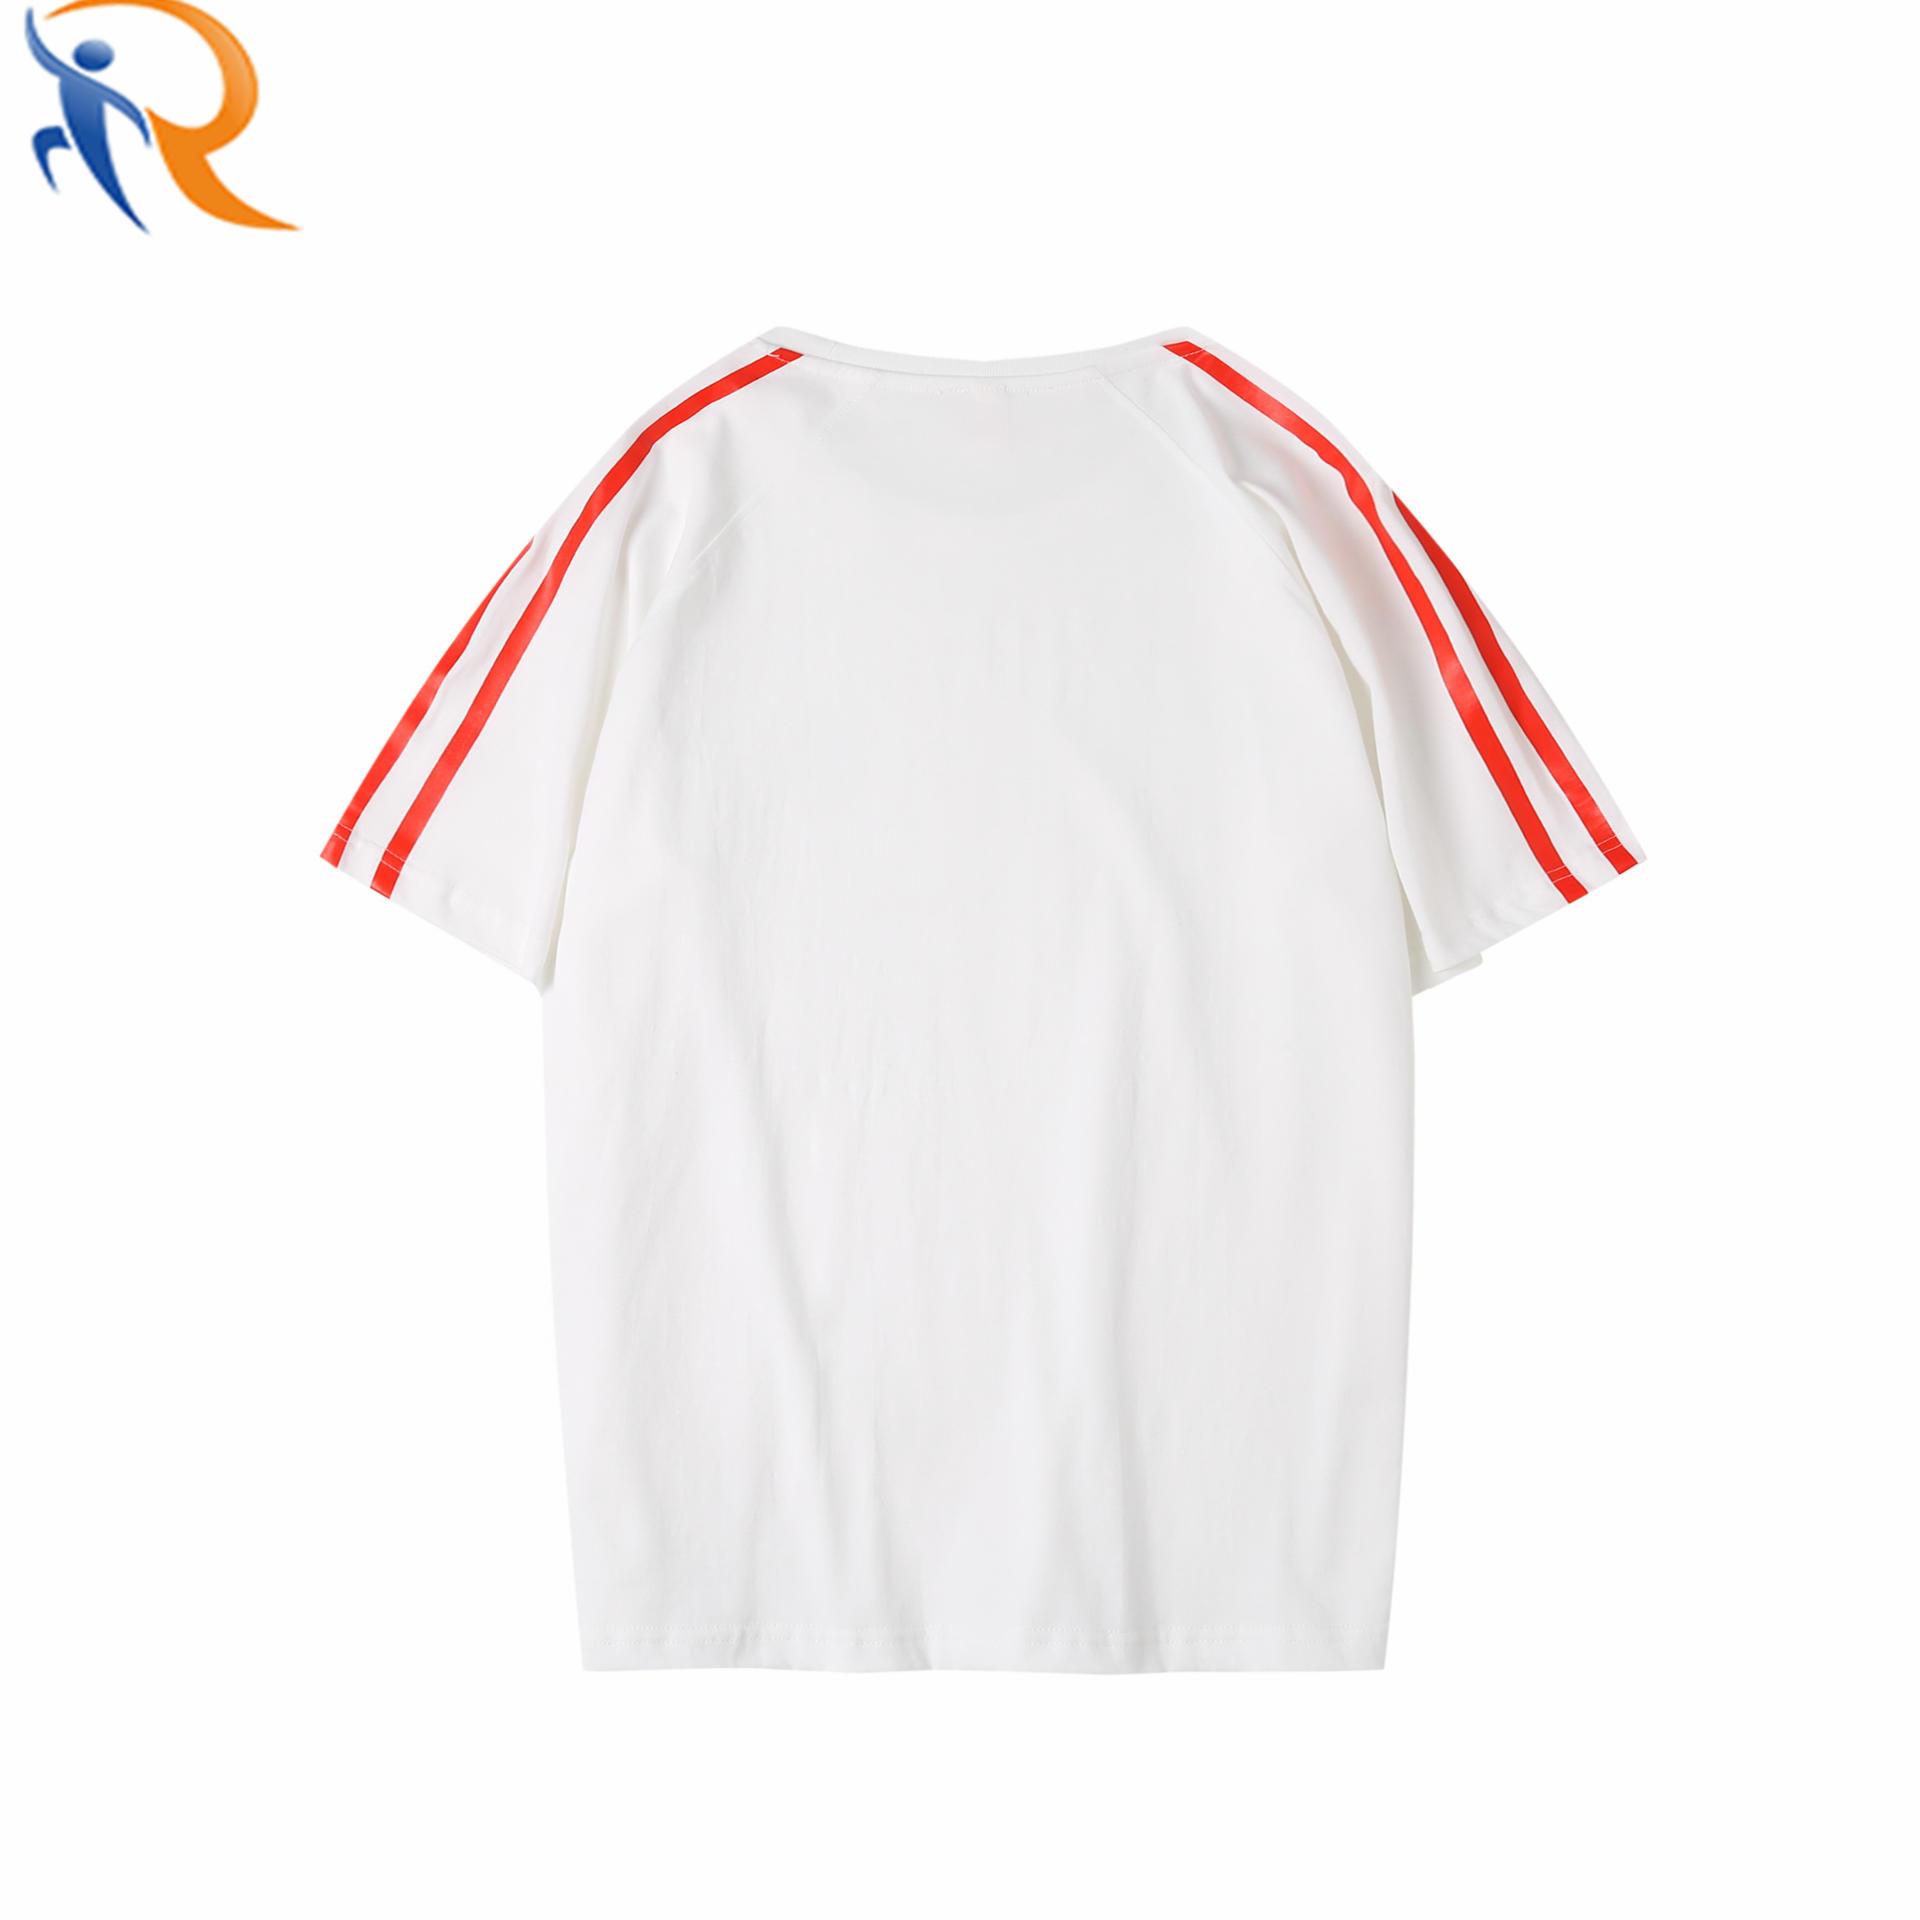 Wholesales Summer Girls Round Neck T-Shirts Short Sleeve Women Casual T Shirt Plain 100% Cotton Tshirt